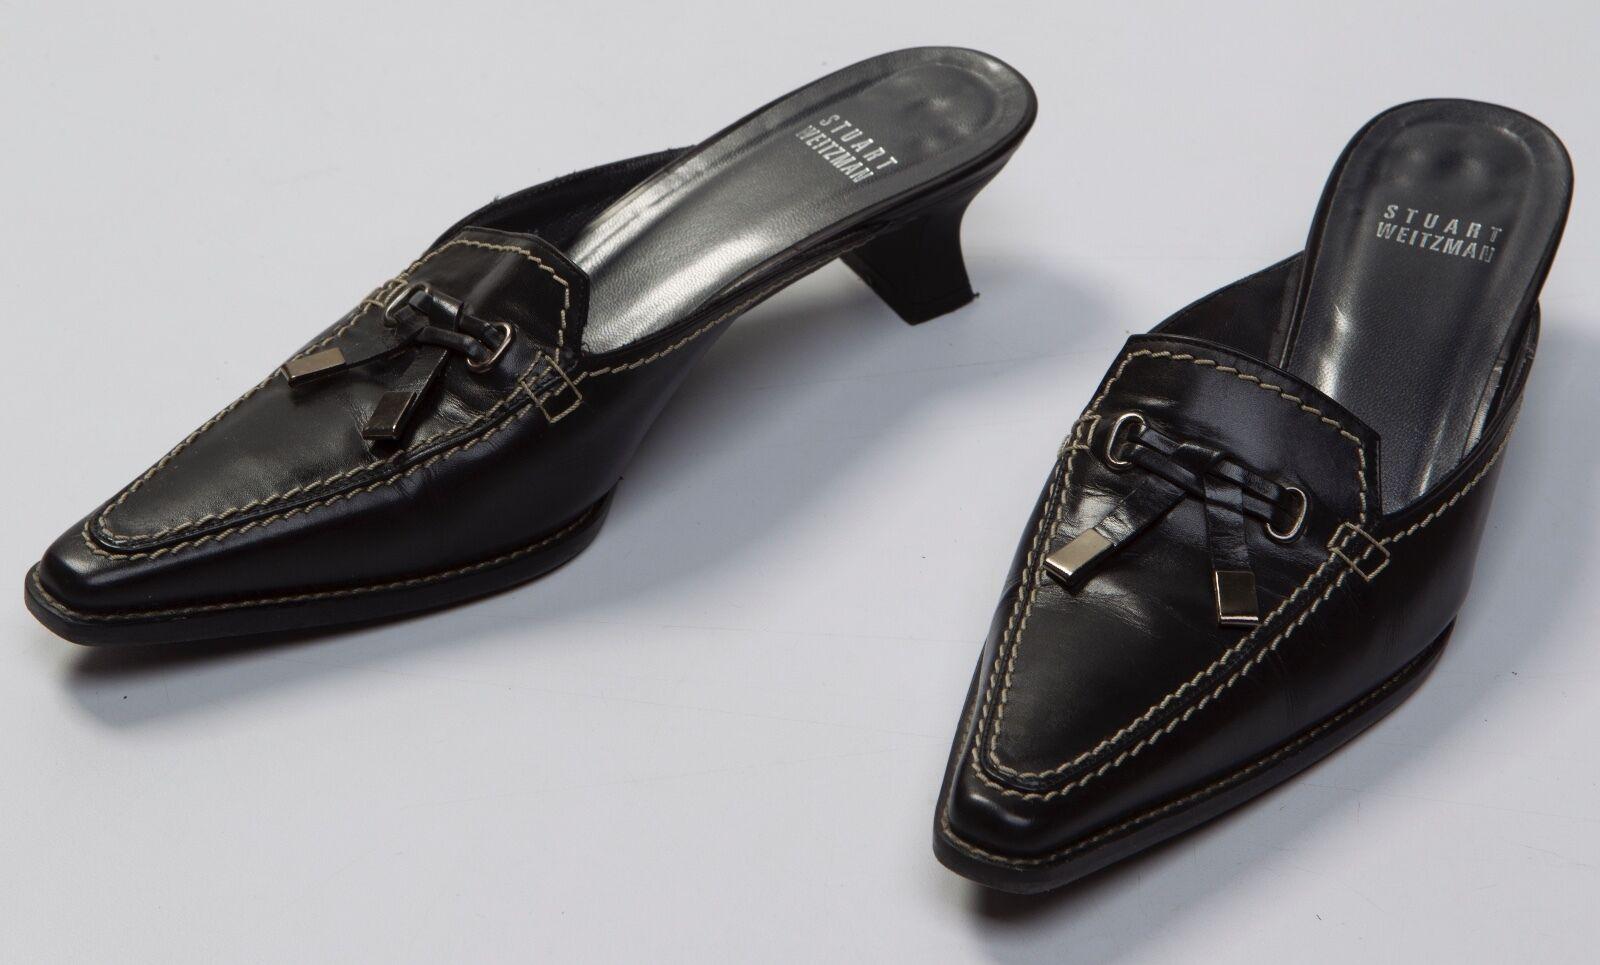 Women's Stuart Weitzman Black Leather Closed Pointy Toe Mules Heels Heels Heels shoes 6.5 M 20fc4b